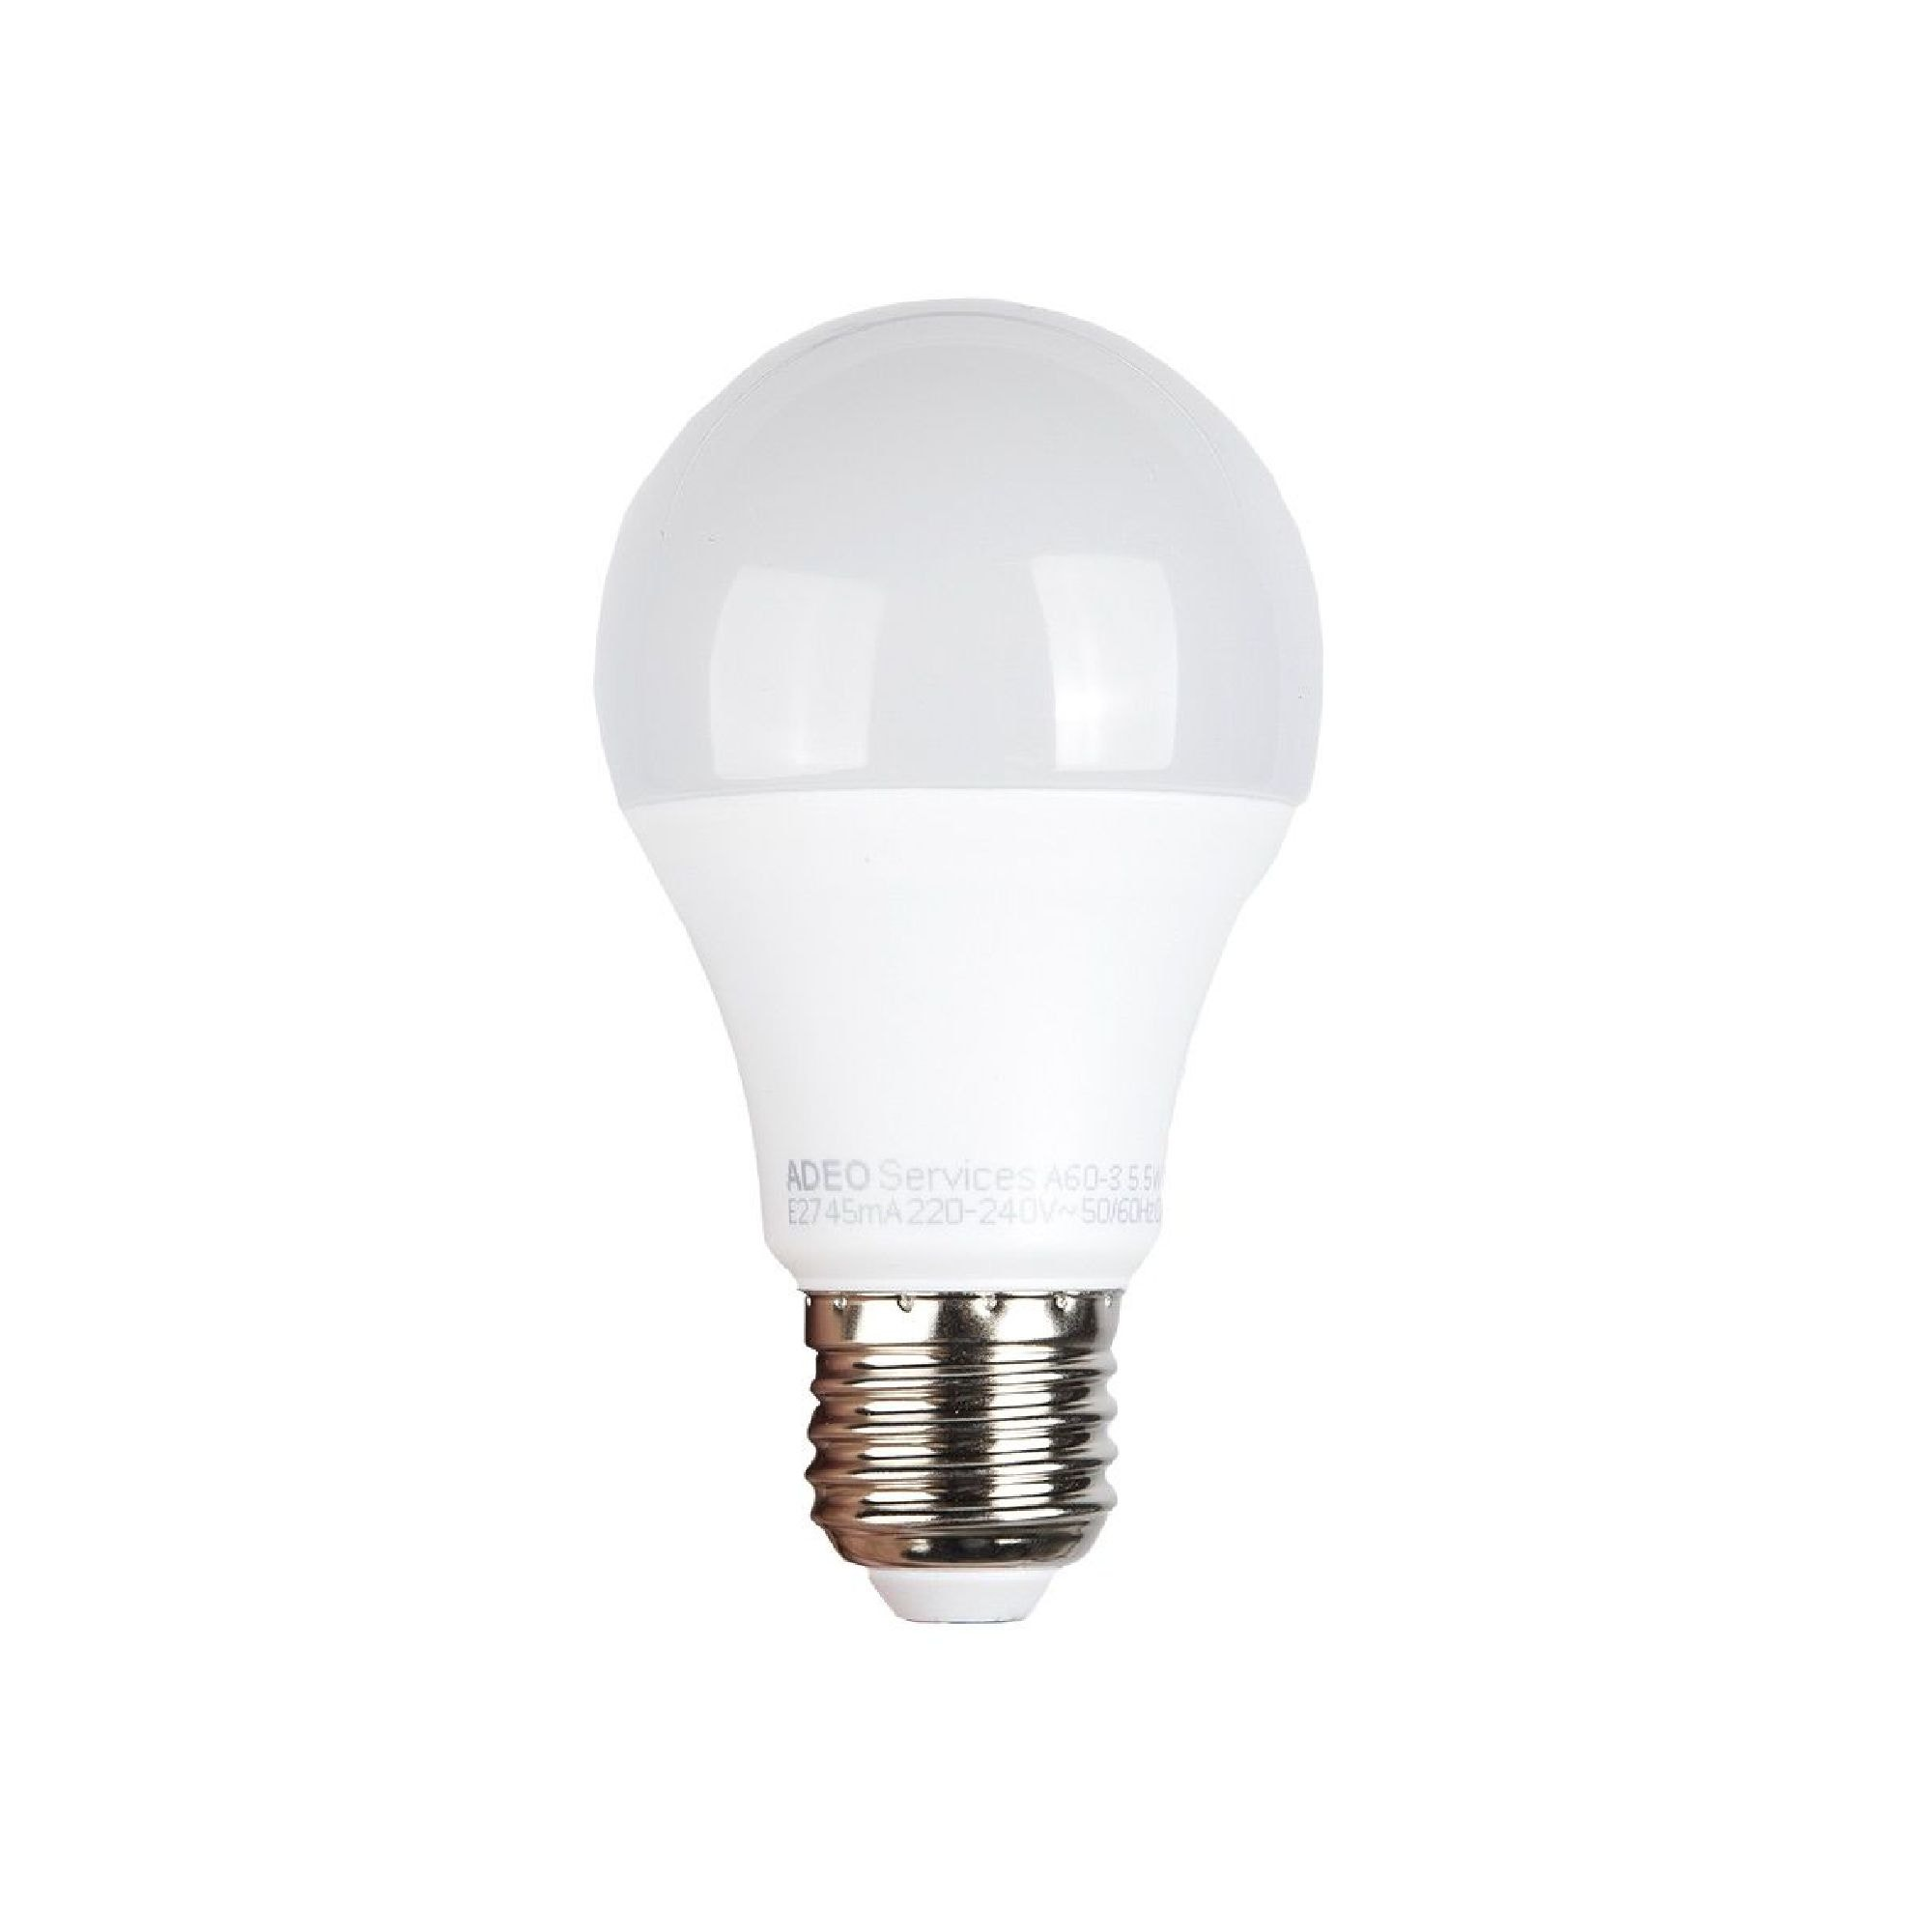 Bec LED clasic cu lumina calda, E27